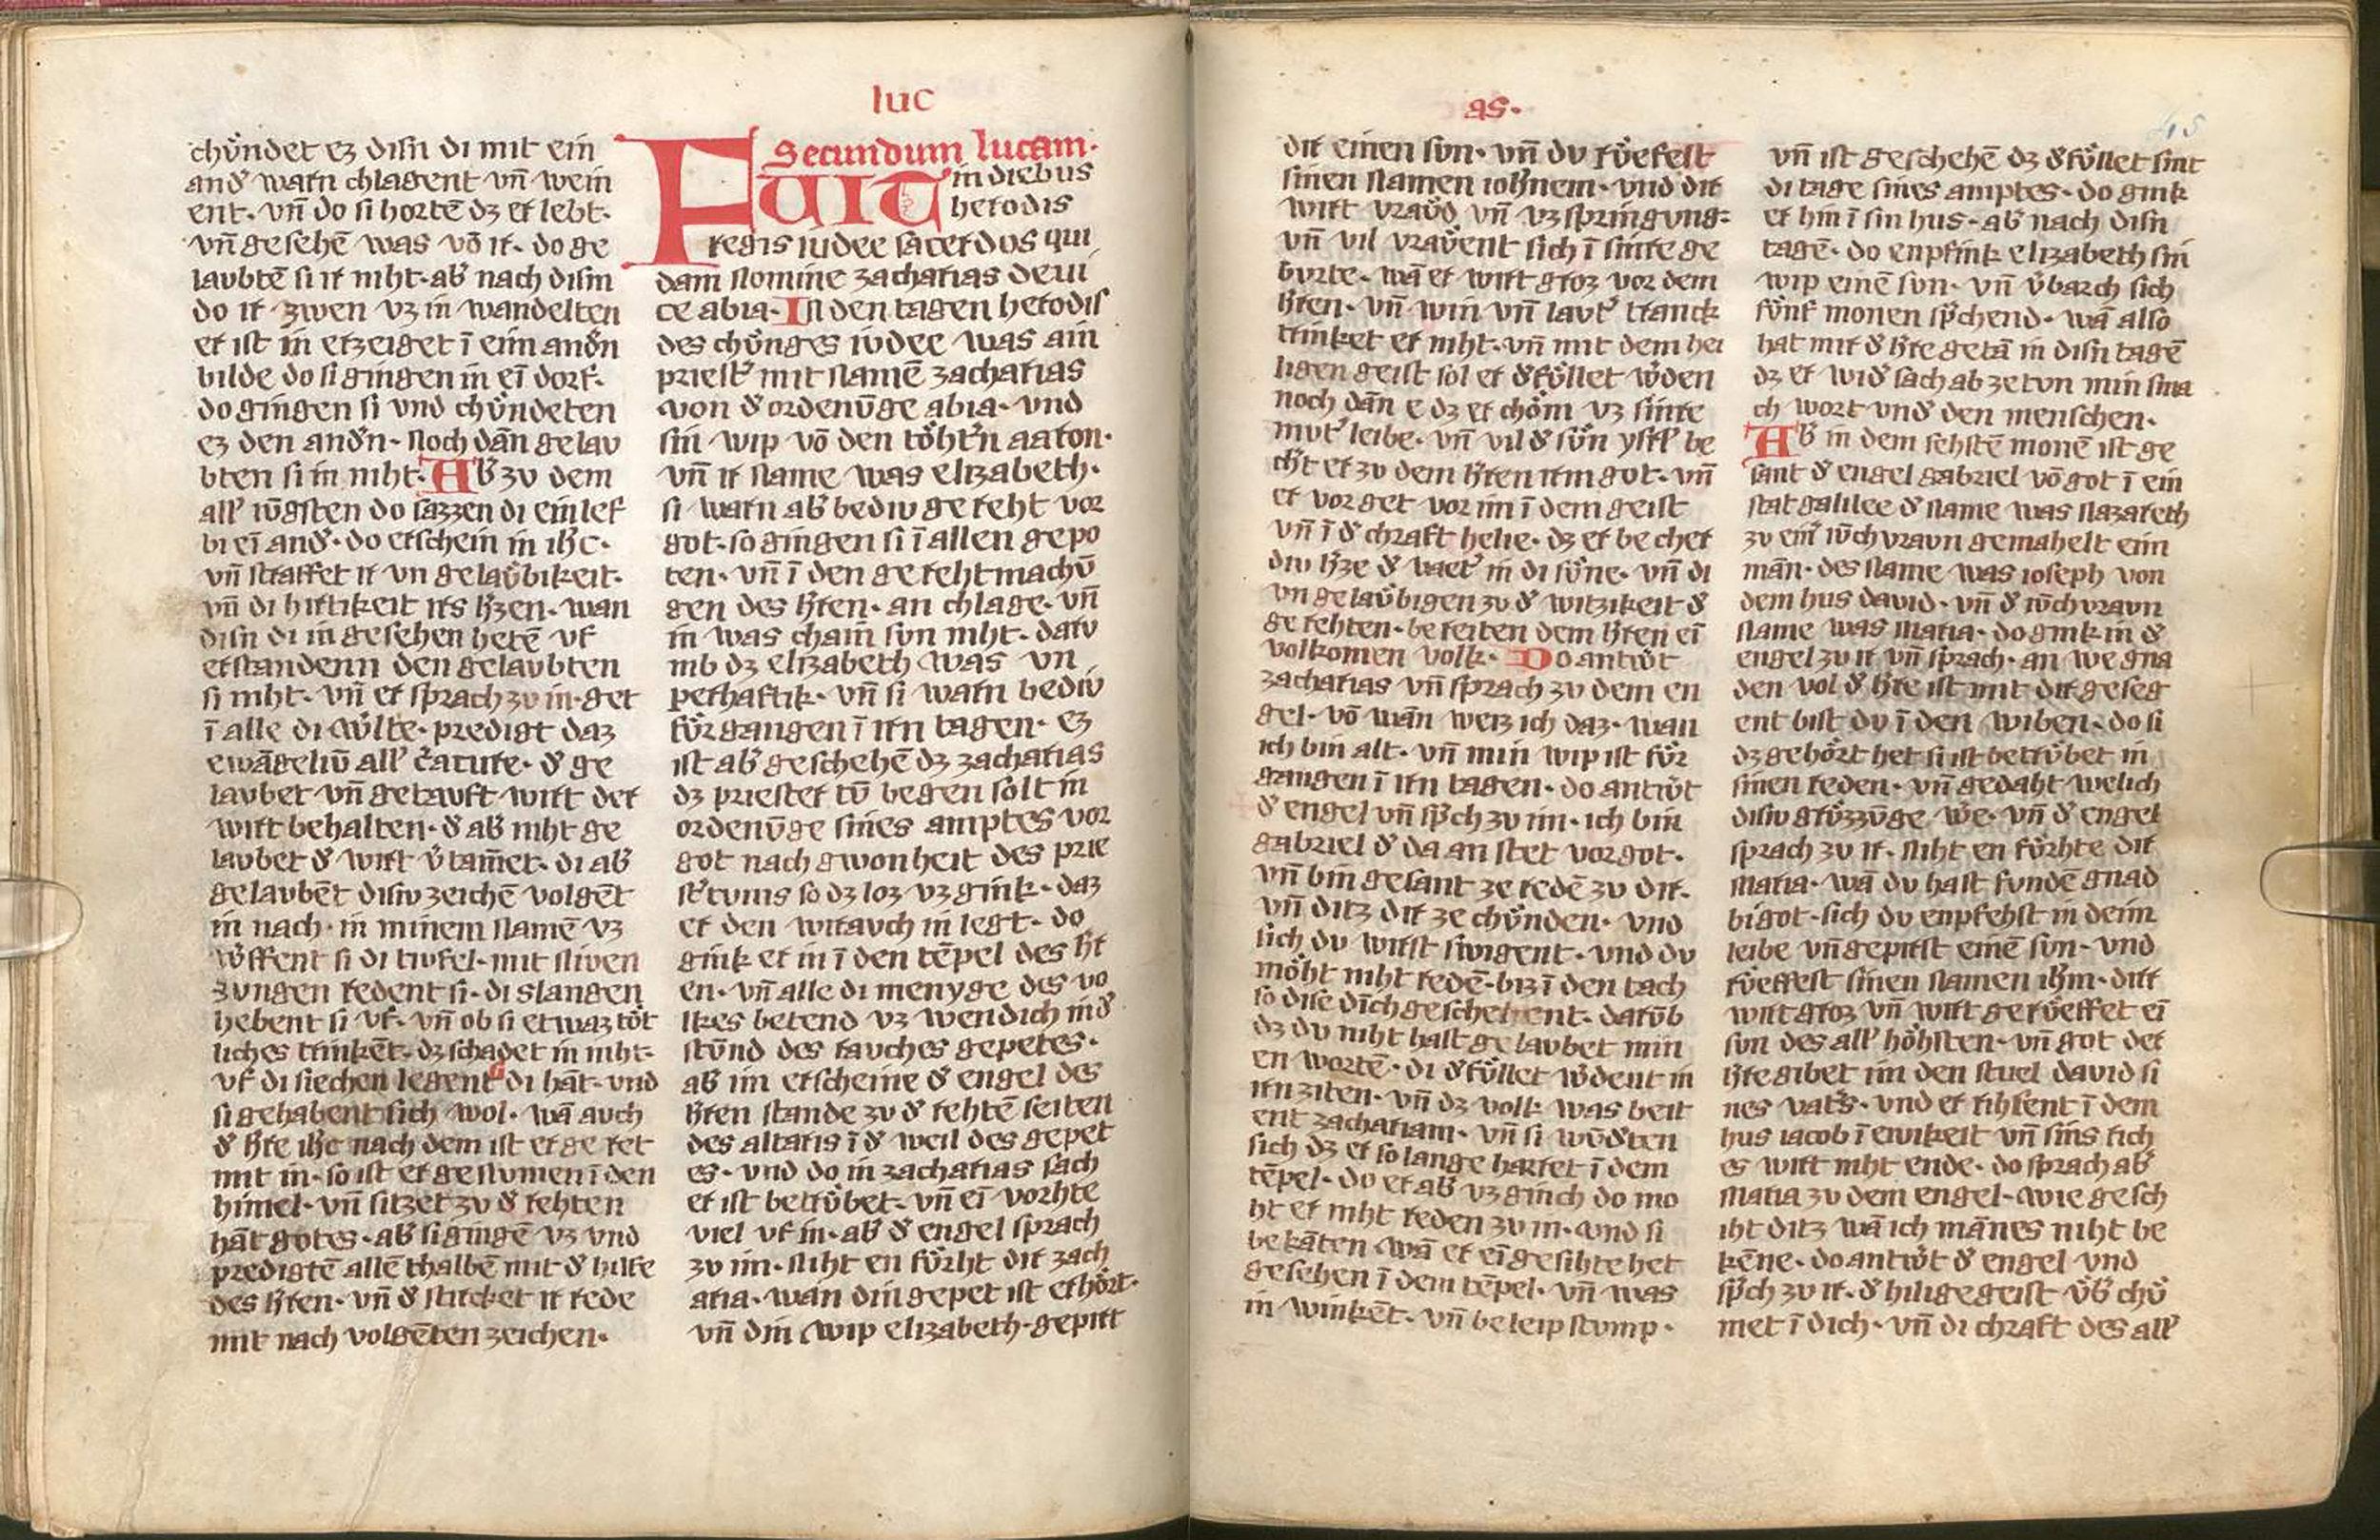 AUGSBURG BIBLE